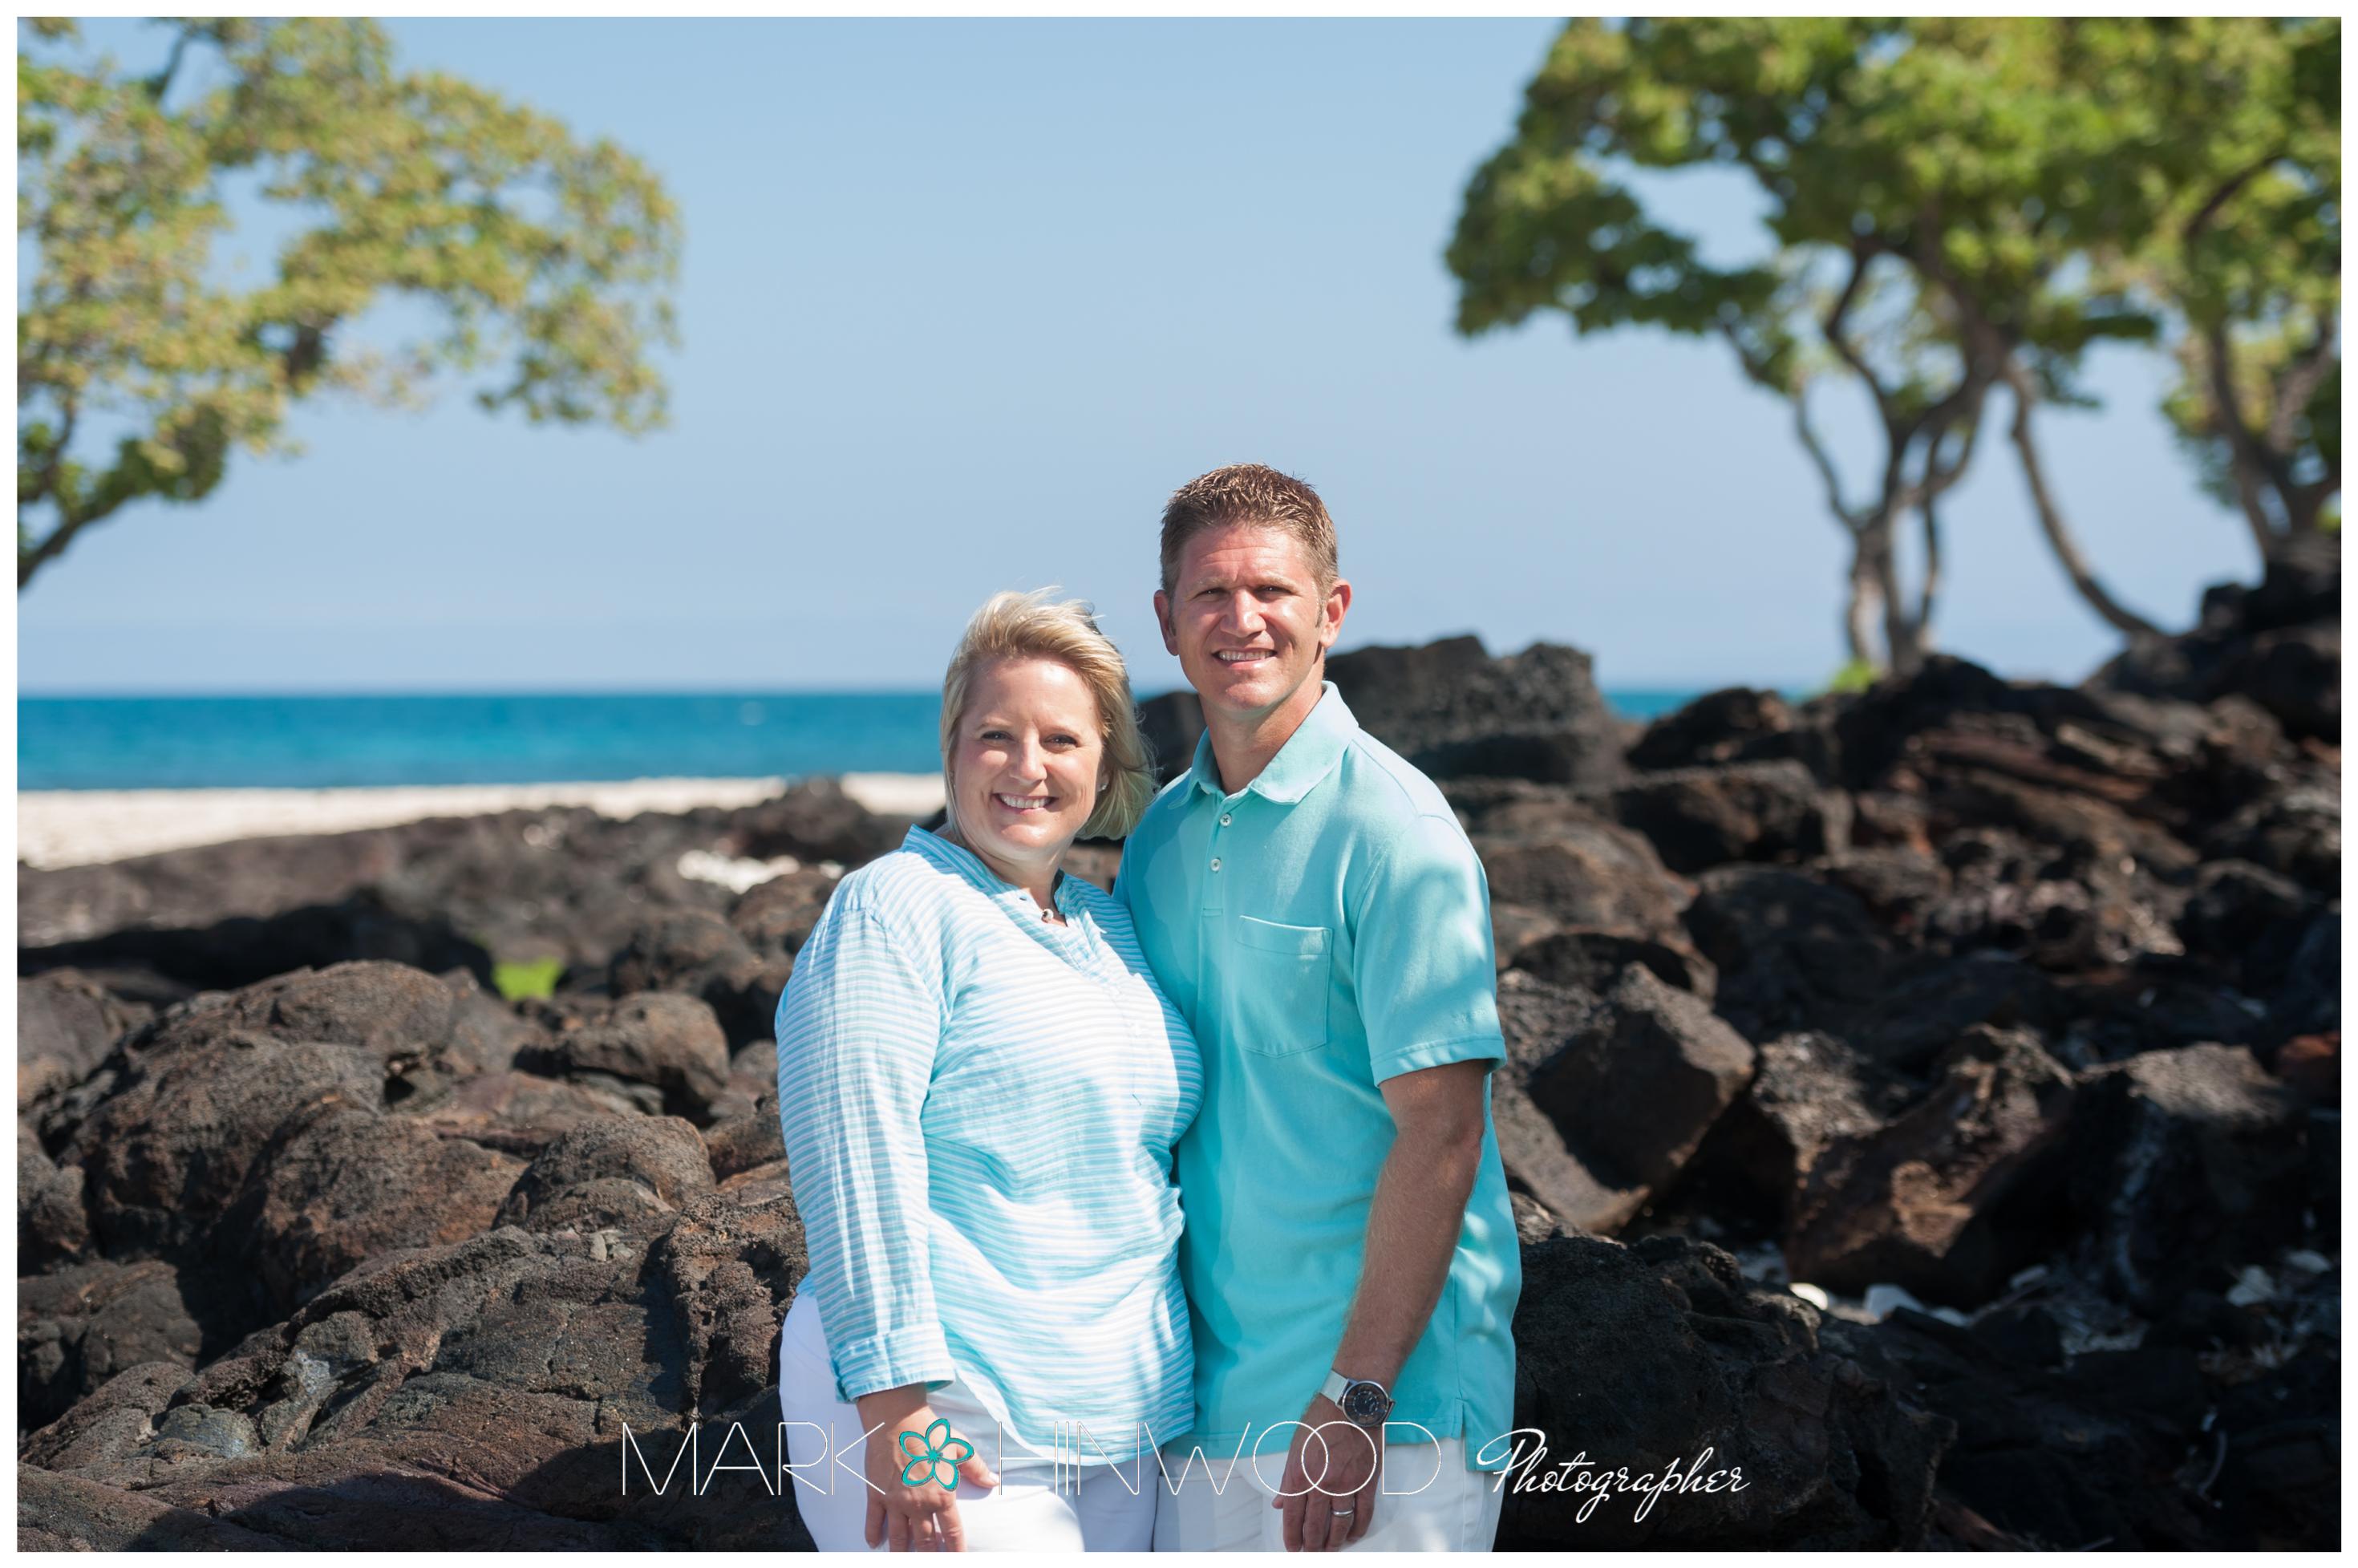 Big Island Family photographer 19